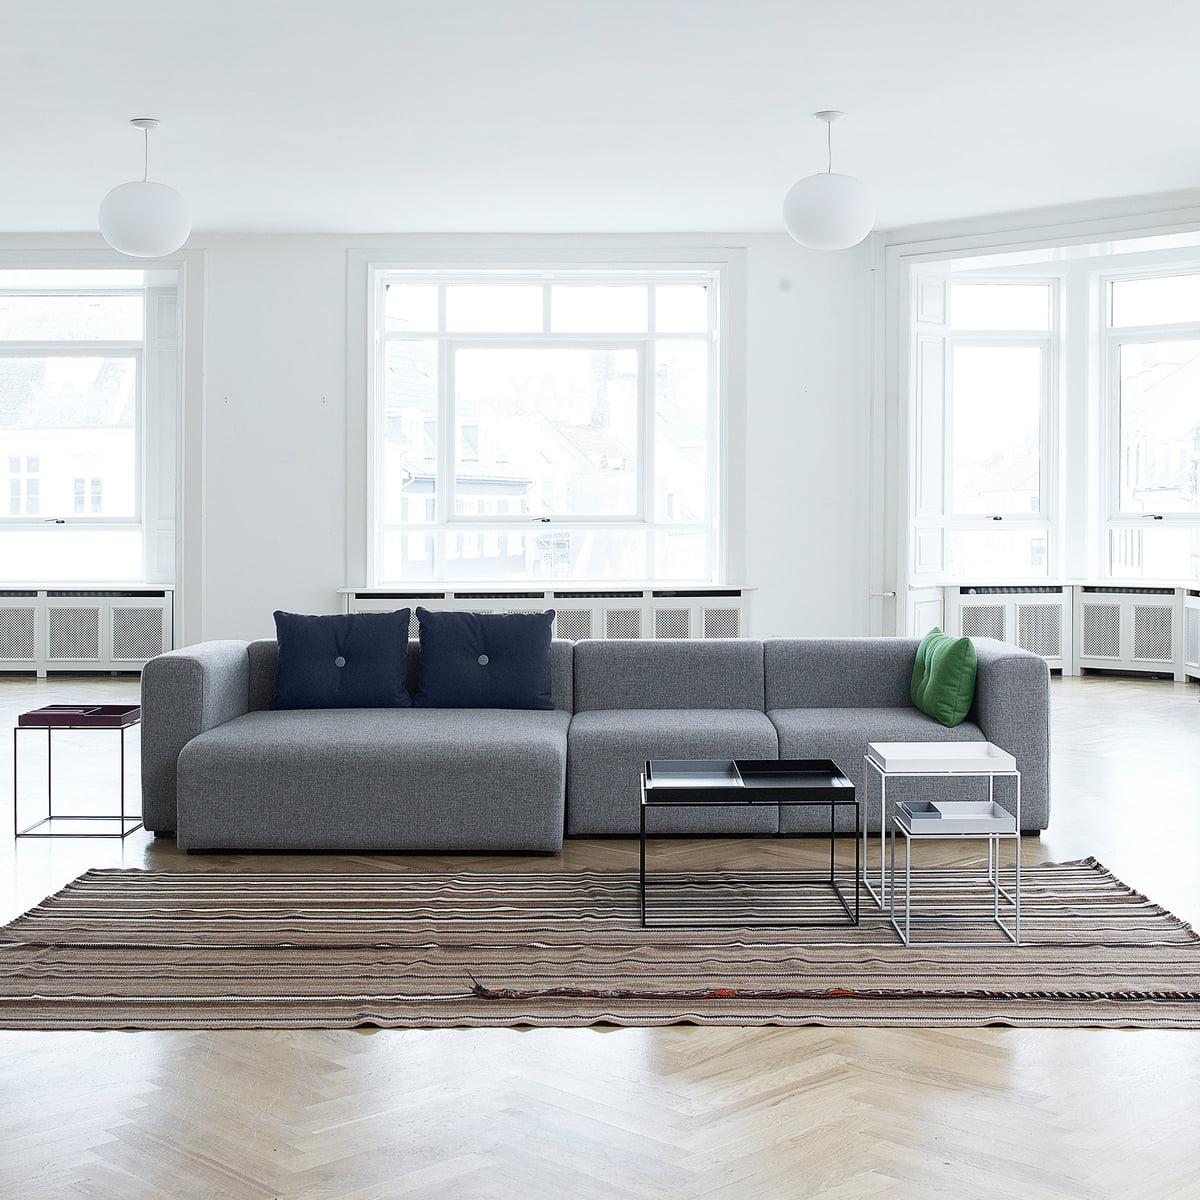 mags sofa module wide von hay. Black Bedroom Furniture Sets. Home Design Ideas